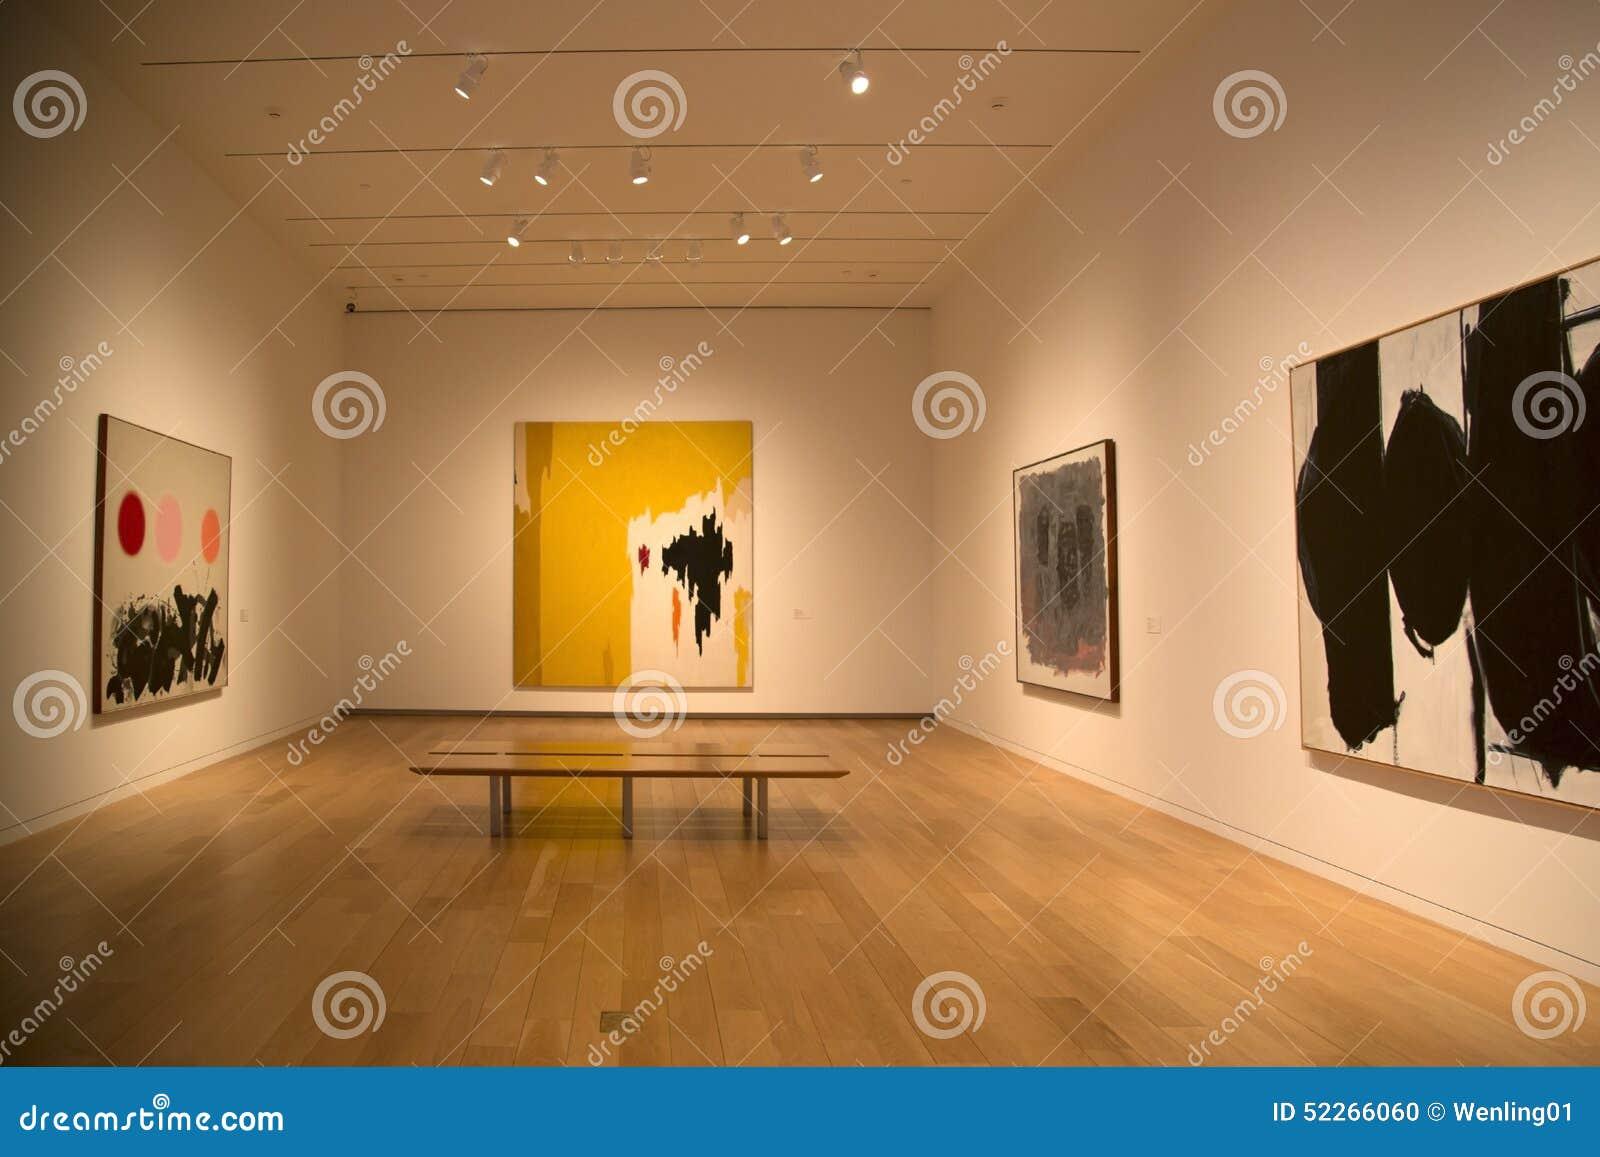 Nice Modern Art Museum Interior